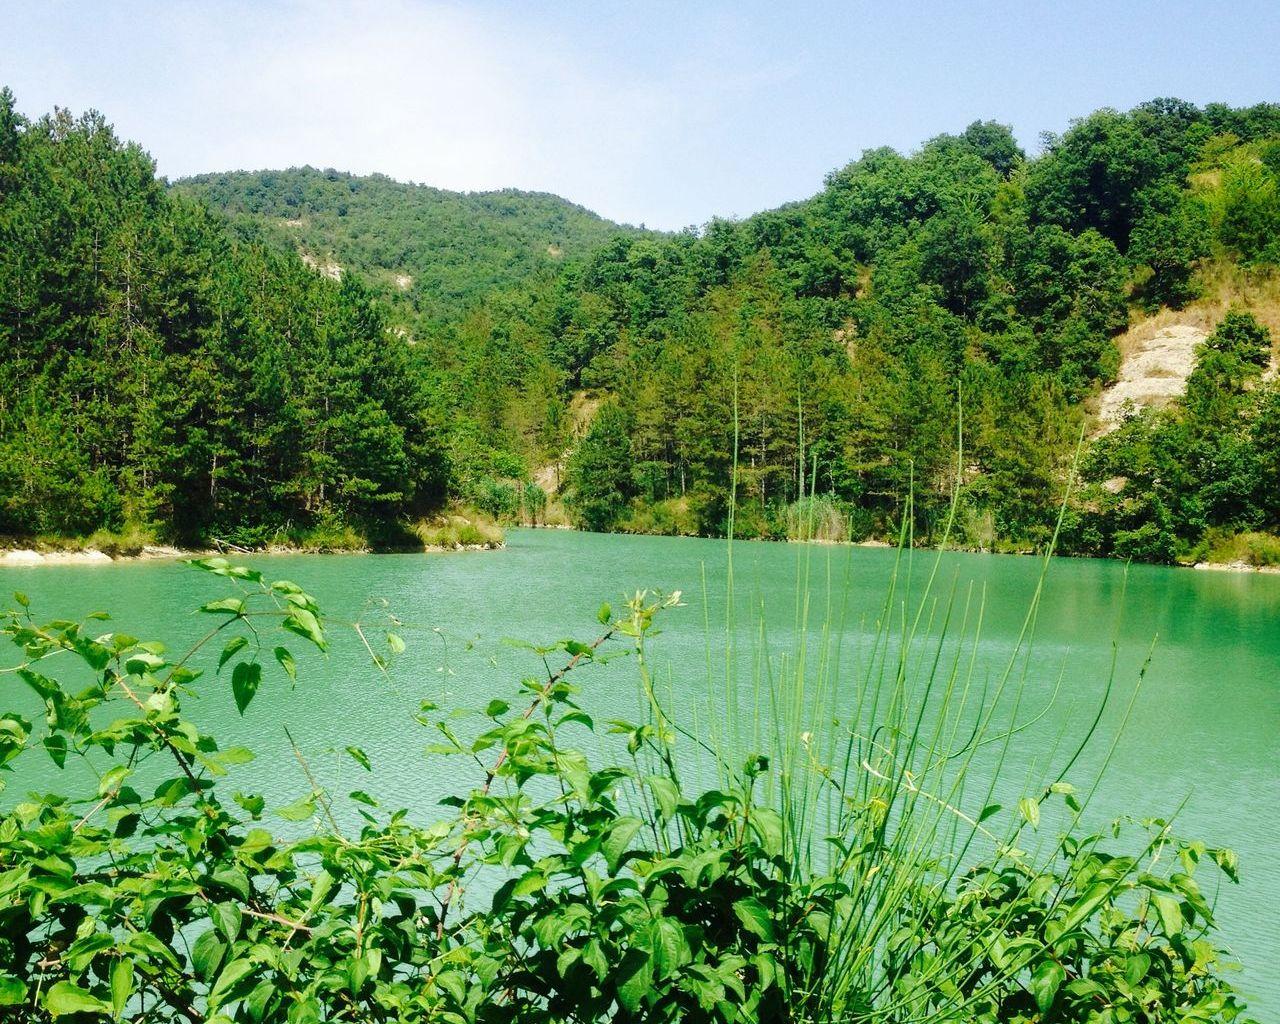 santa-felicita-paterna-turismo-umbria-agriturismo-vacanza-country-house-0-100_8